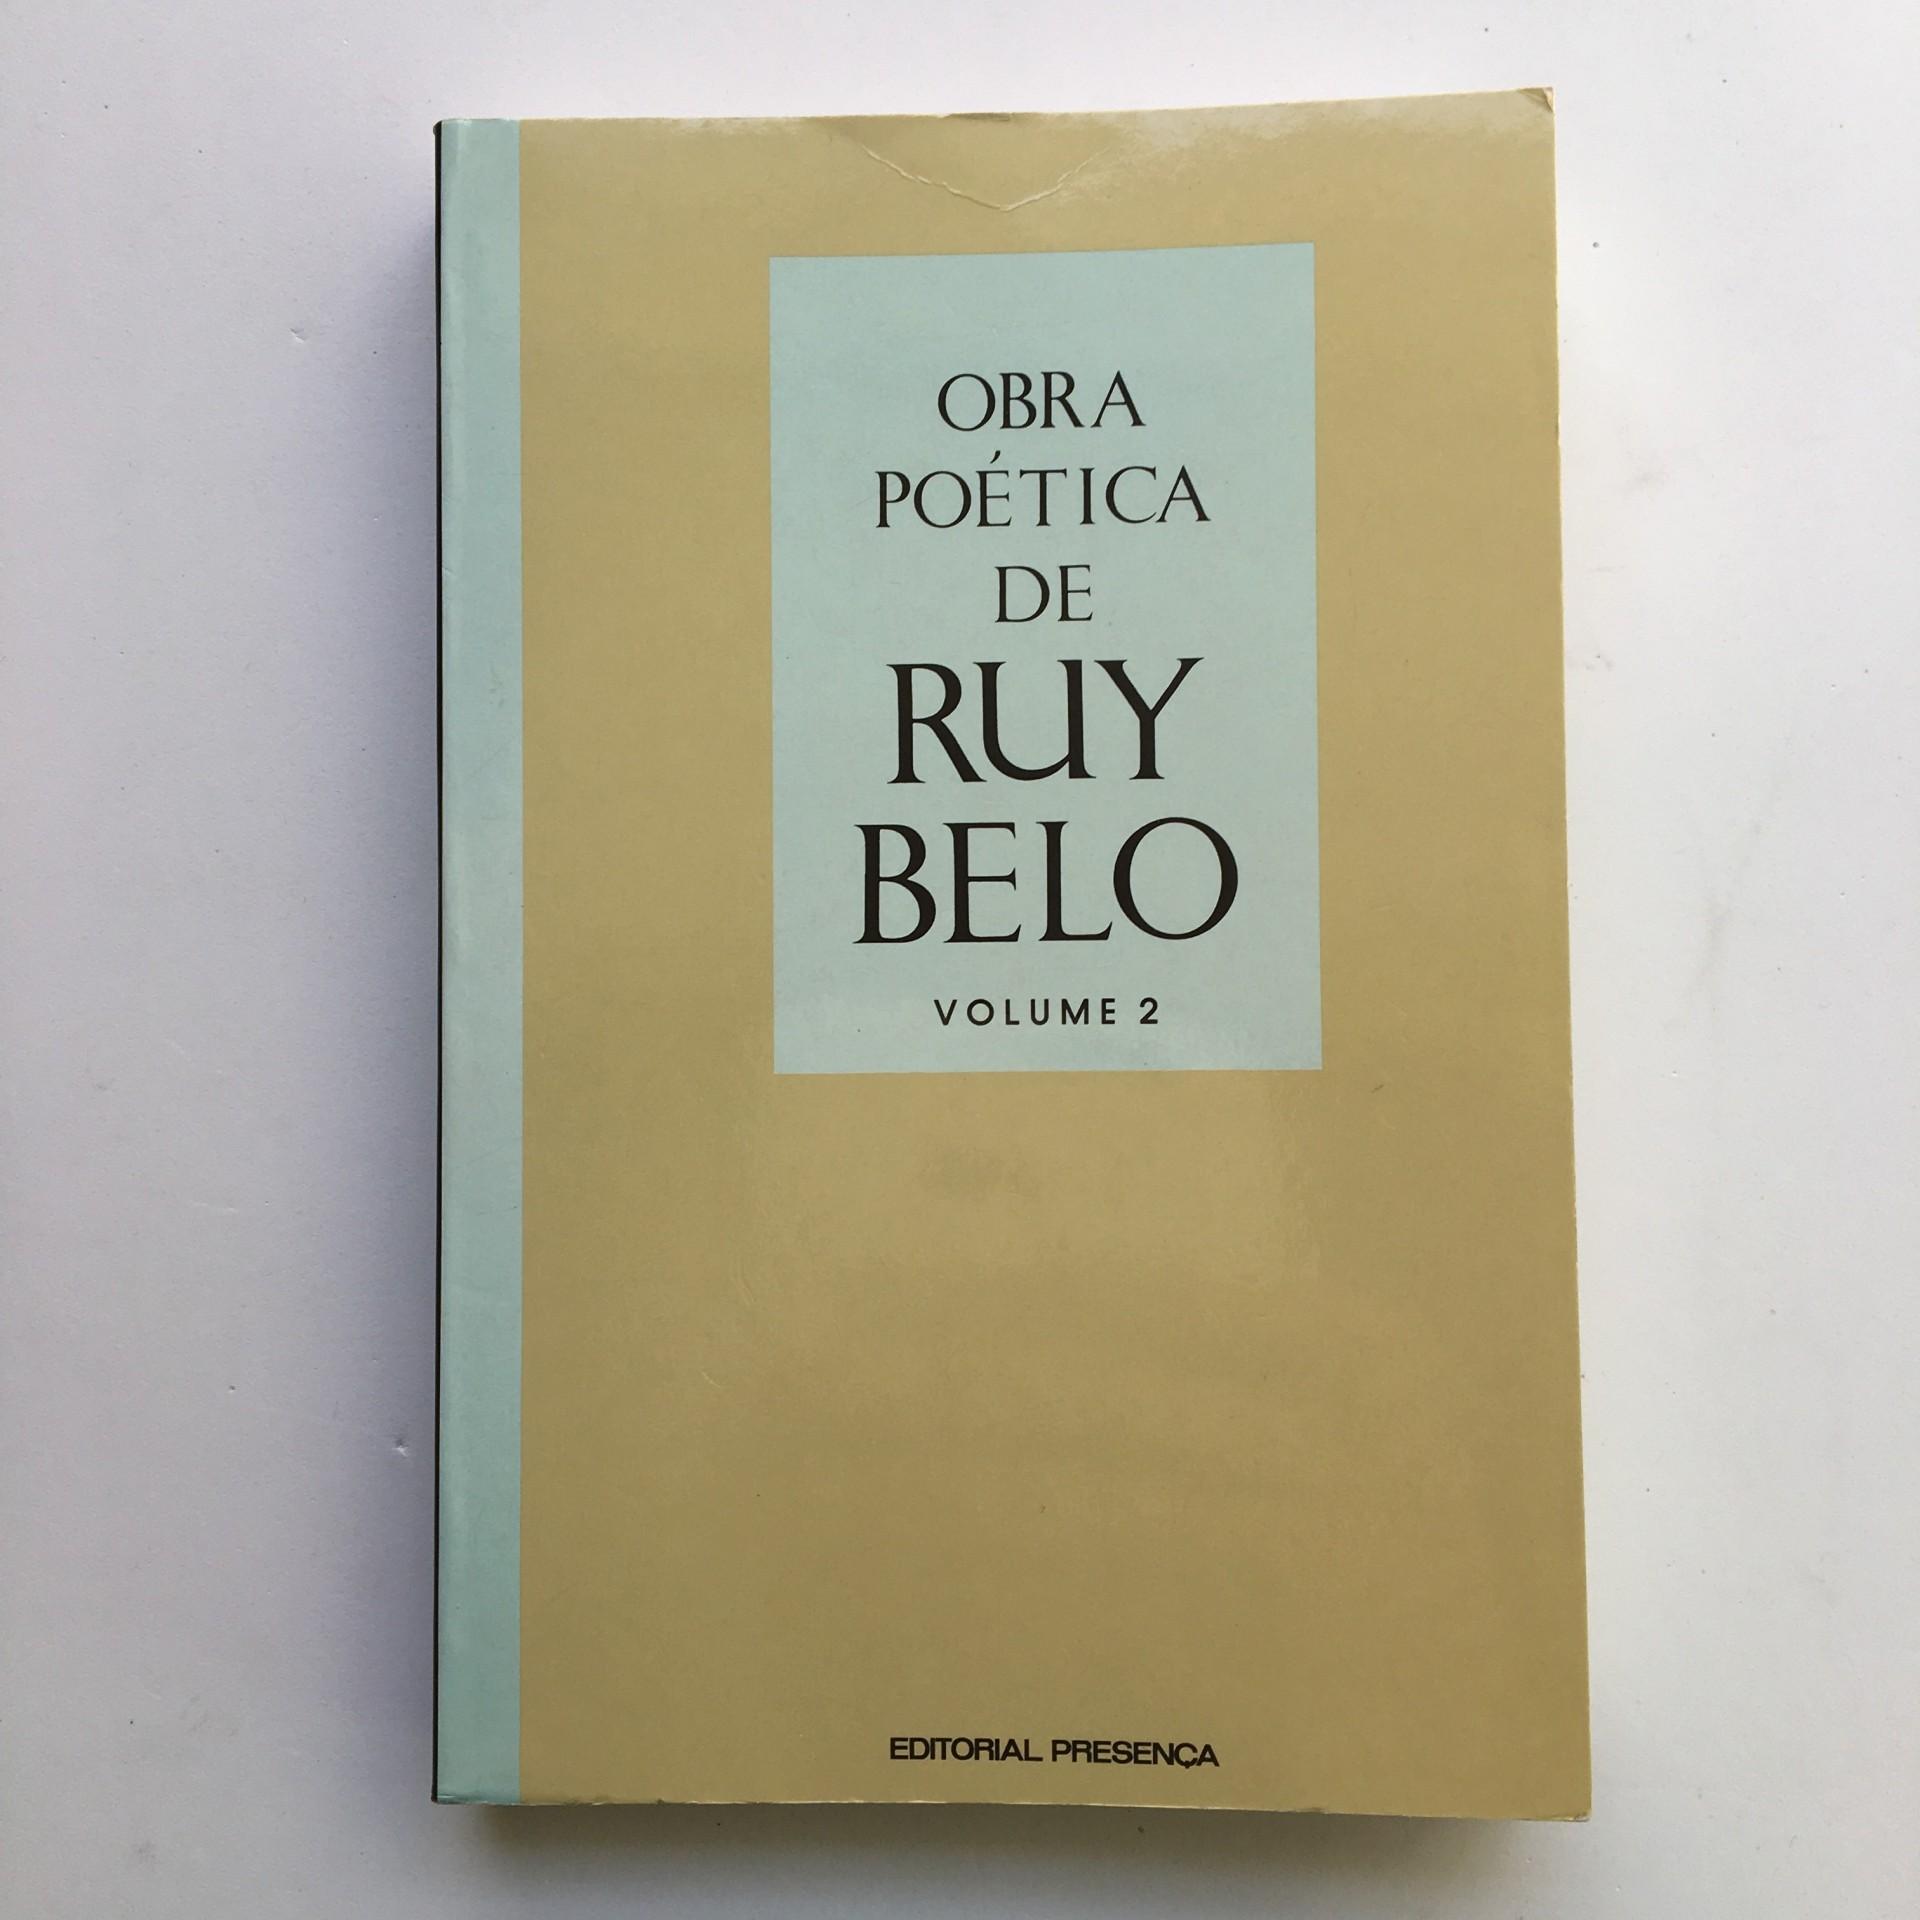 Obra Poética de Ruy Belo volume 2